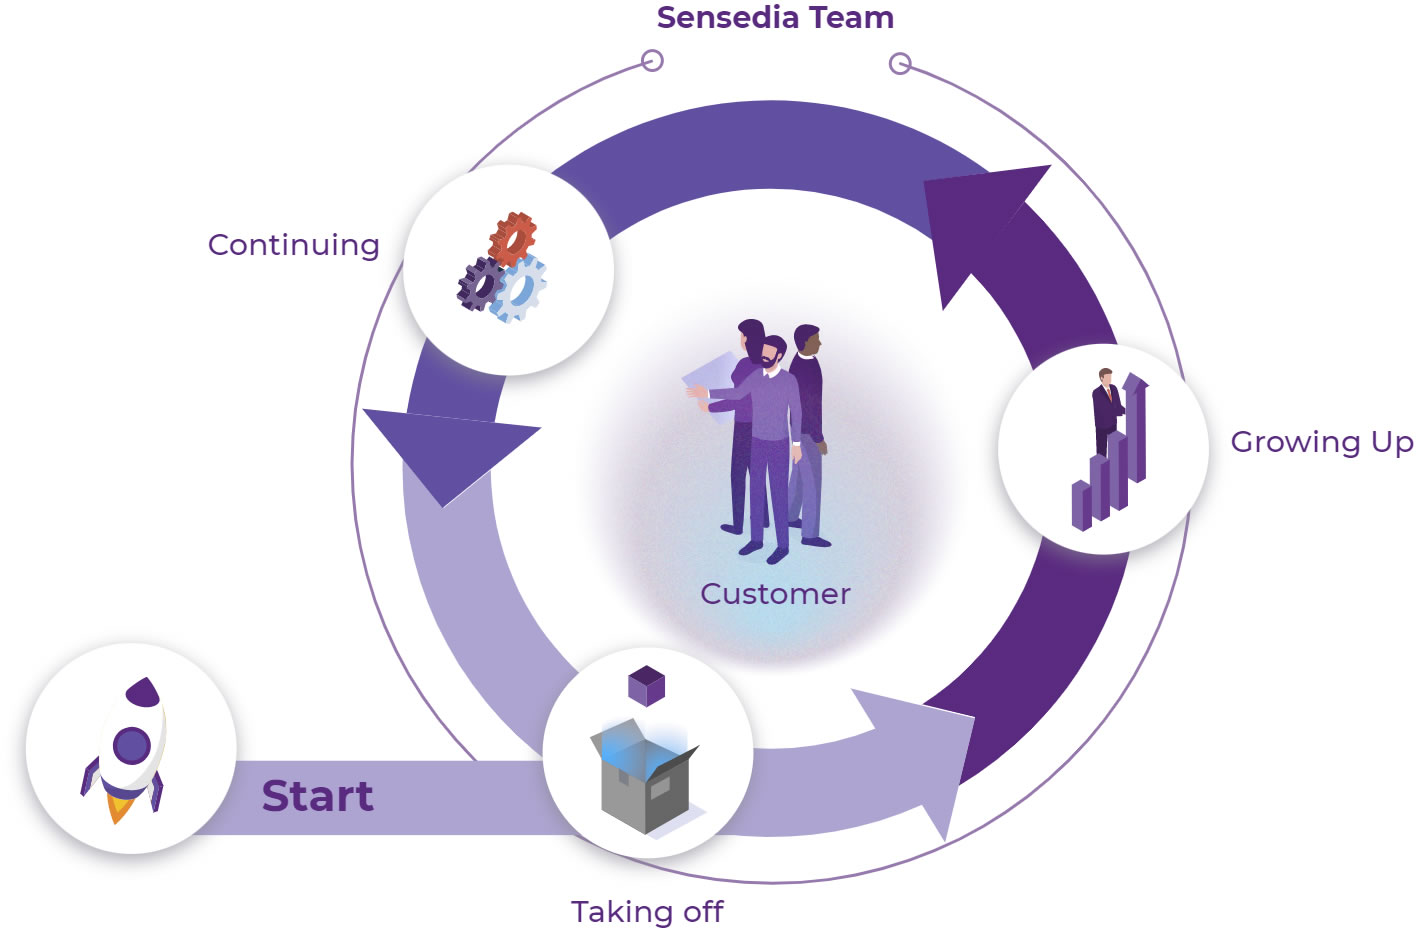 Sensedia Customer Success team API platform